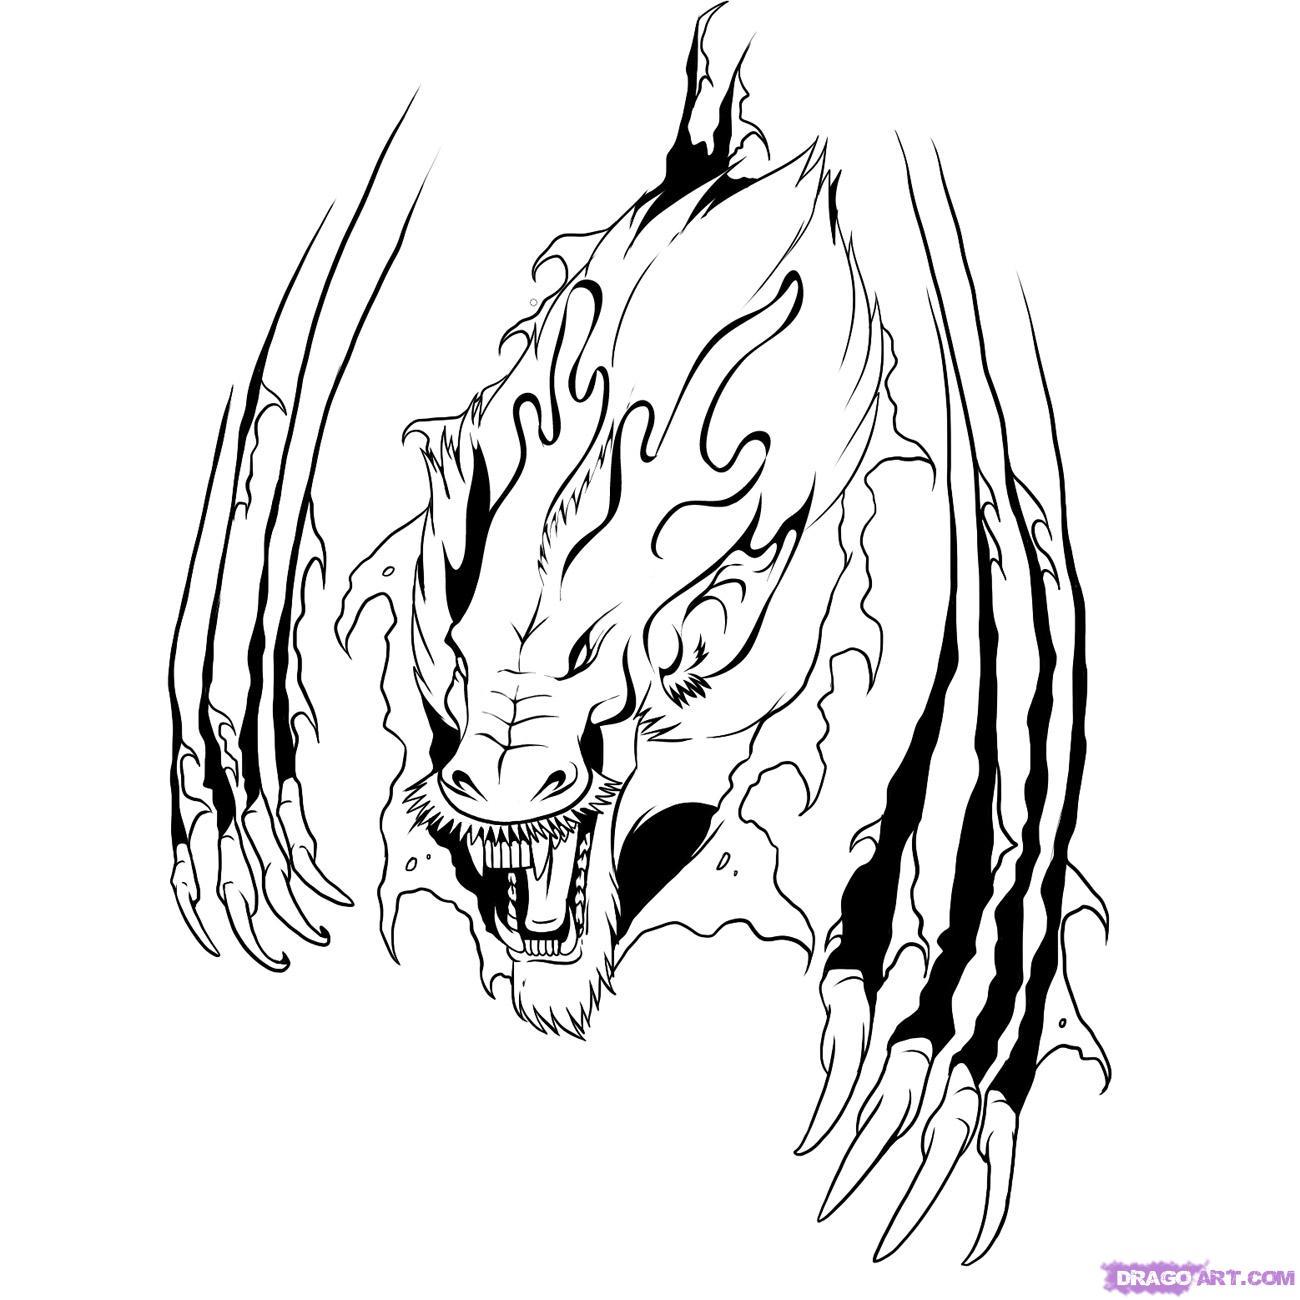 Tattoo Ideas Easy To Draw: Coloriages à Imprimer : Serpent, Numéro : 25854